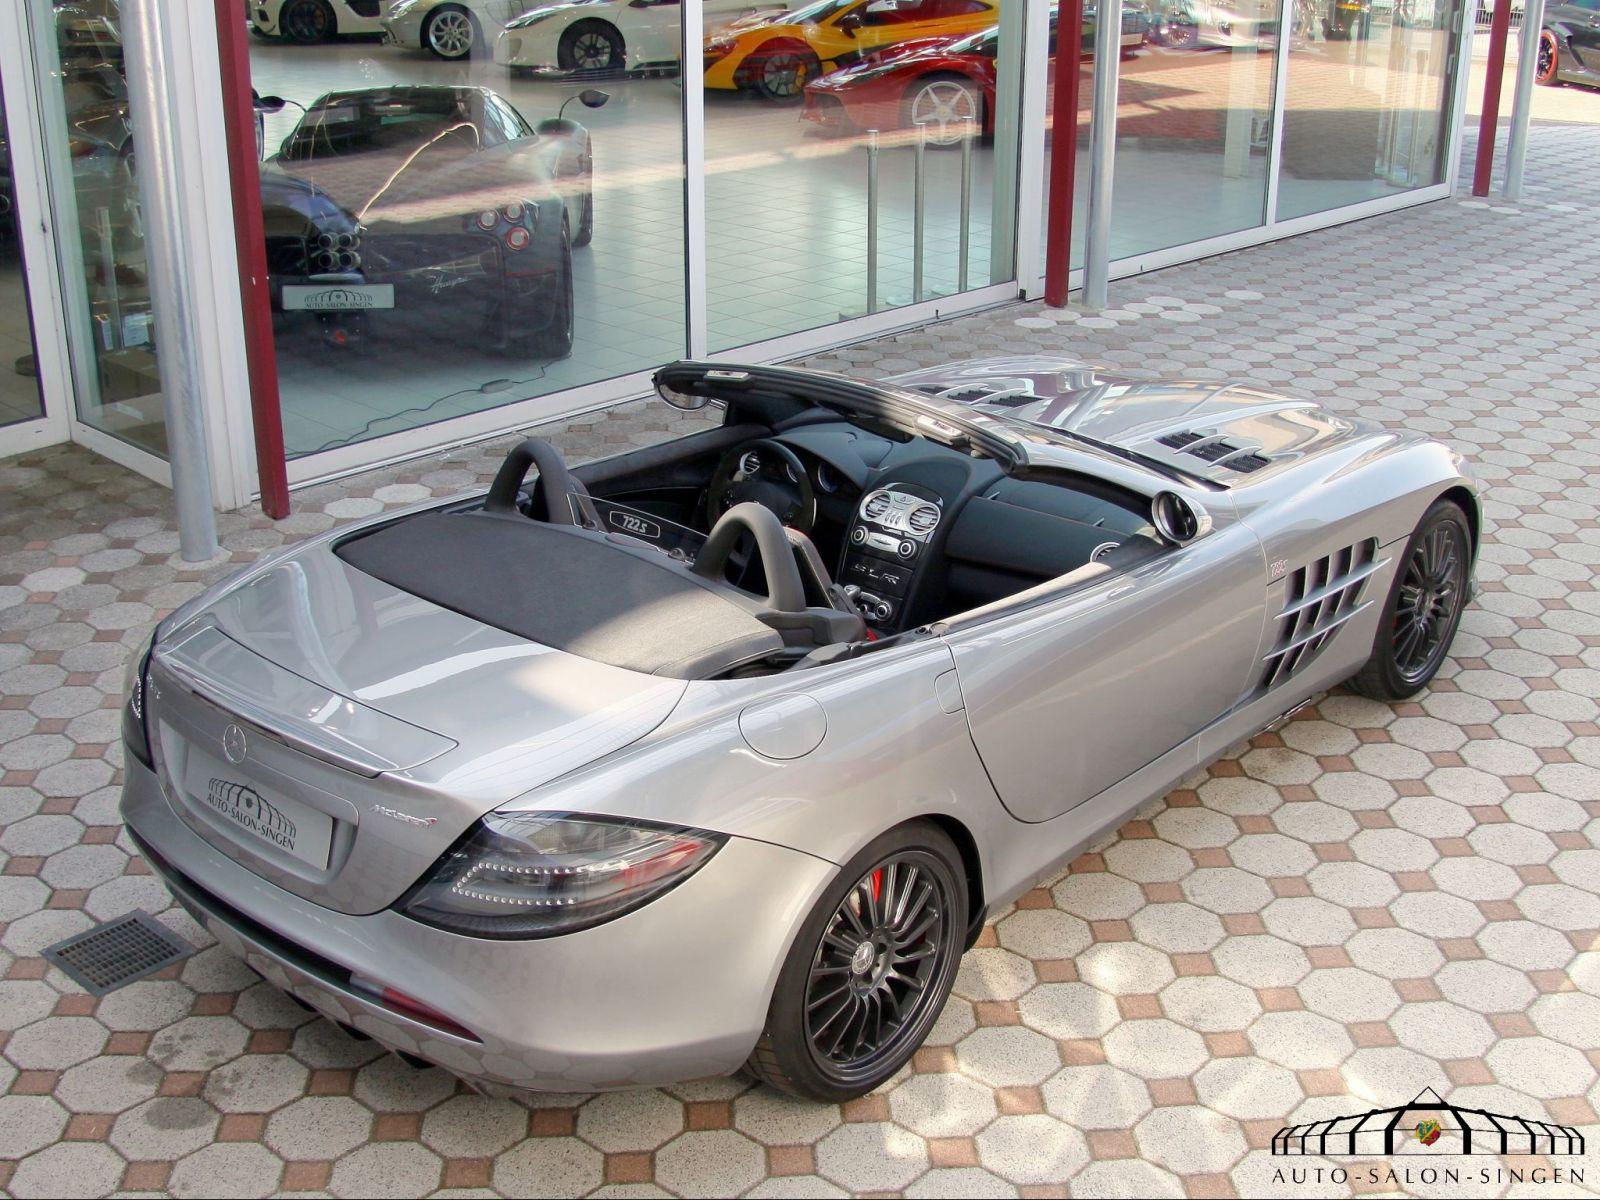 mercedes benz slr mclaren roadster 722 s roadster auto. Black Bedroom Furniture Sets. Home Design Ideas